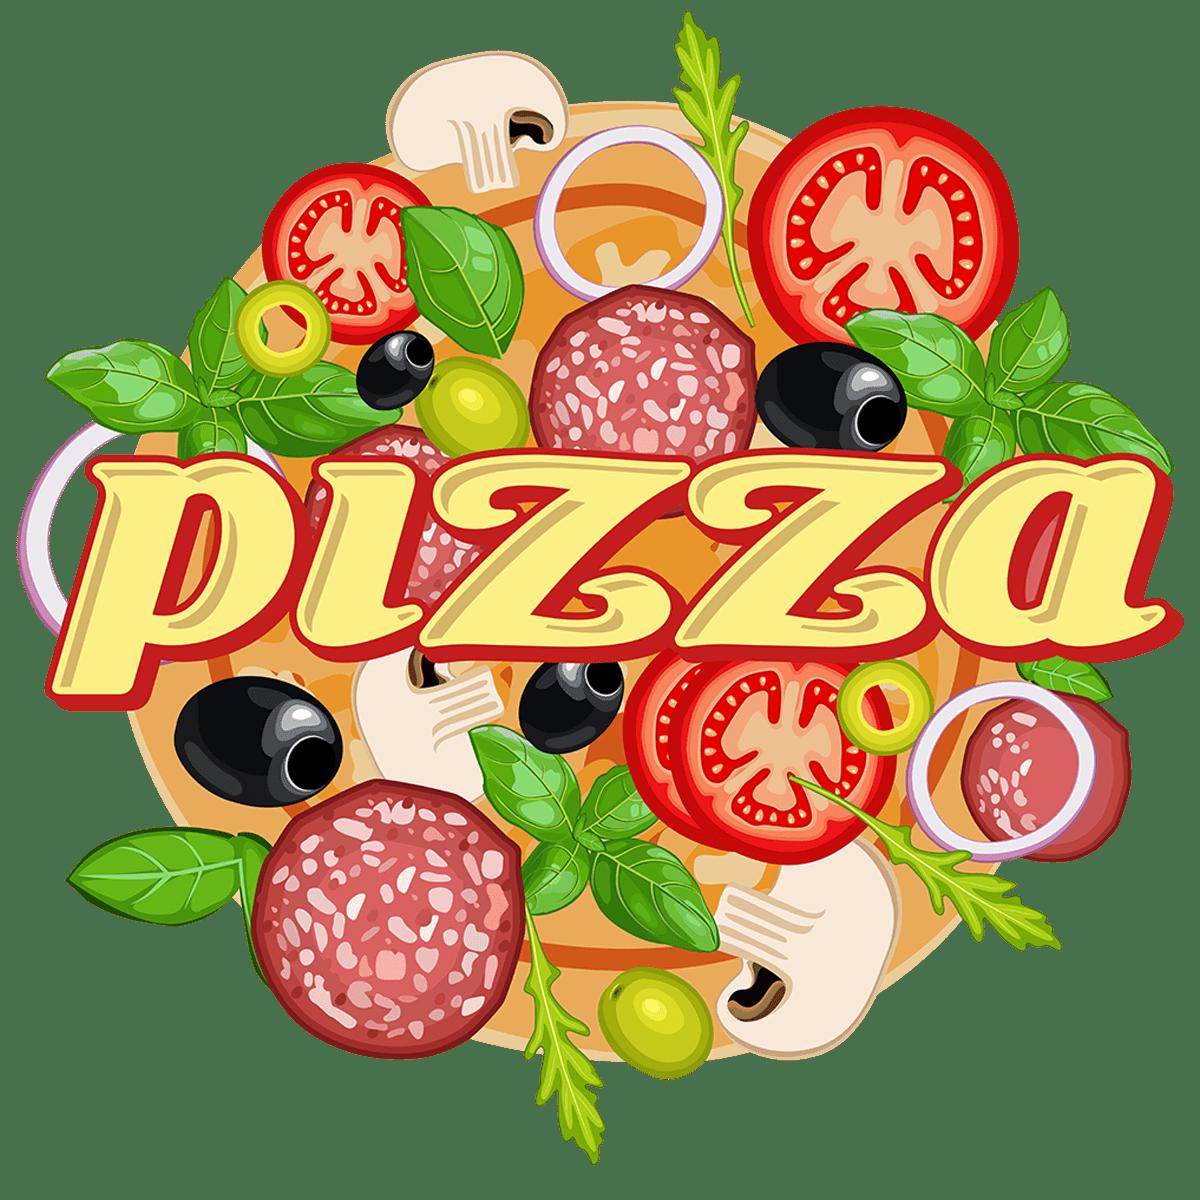 wunschpizza - restiau - restaurant zur au - resti au - pizza